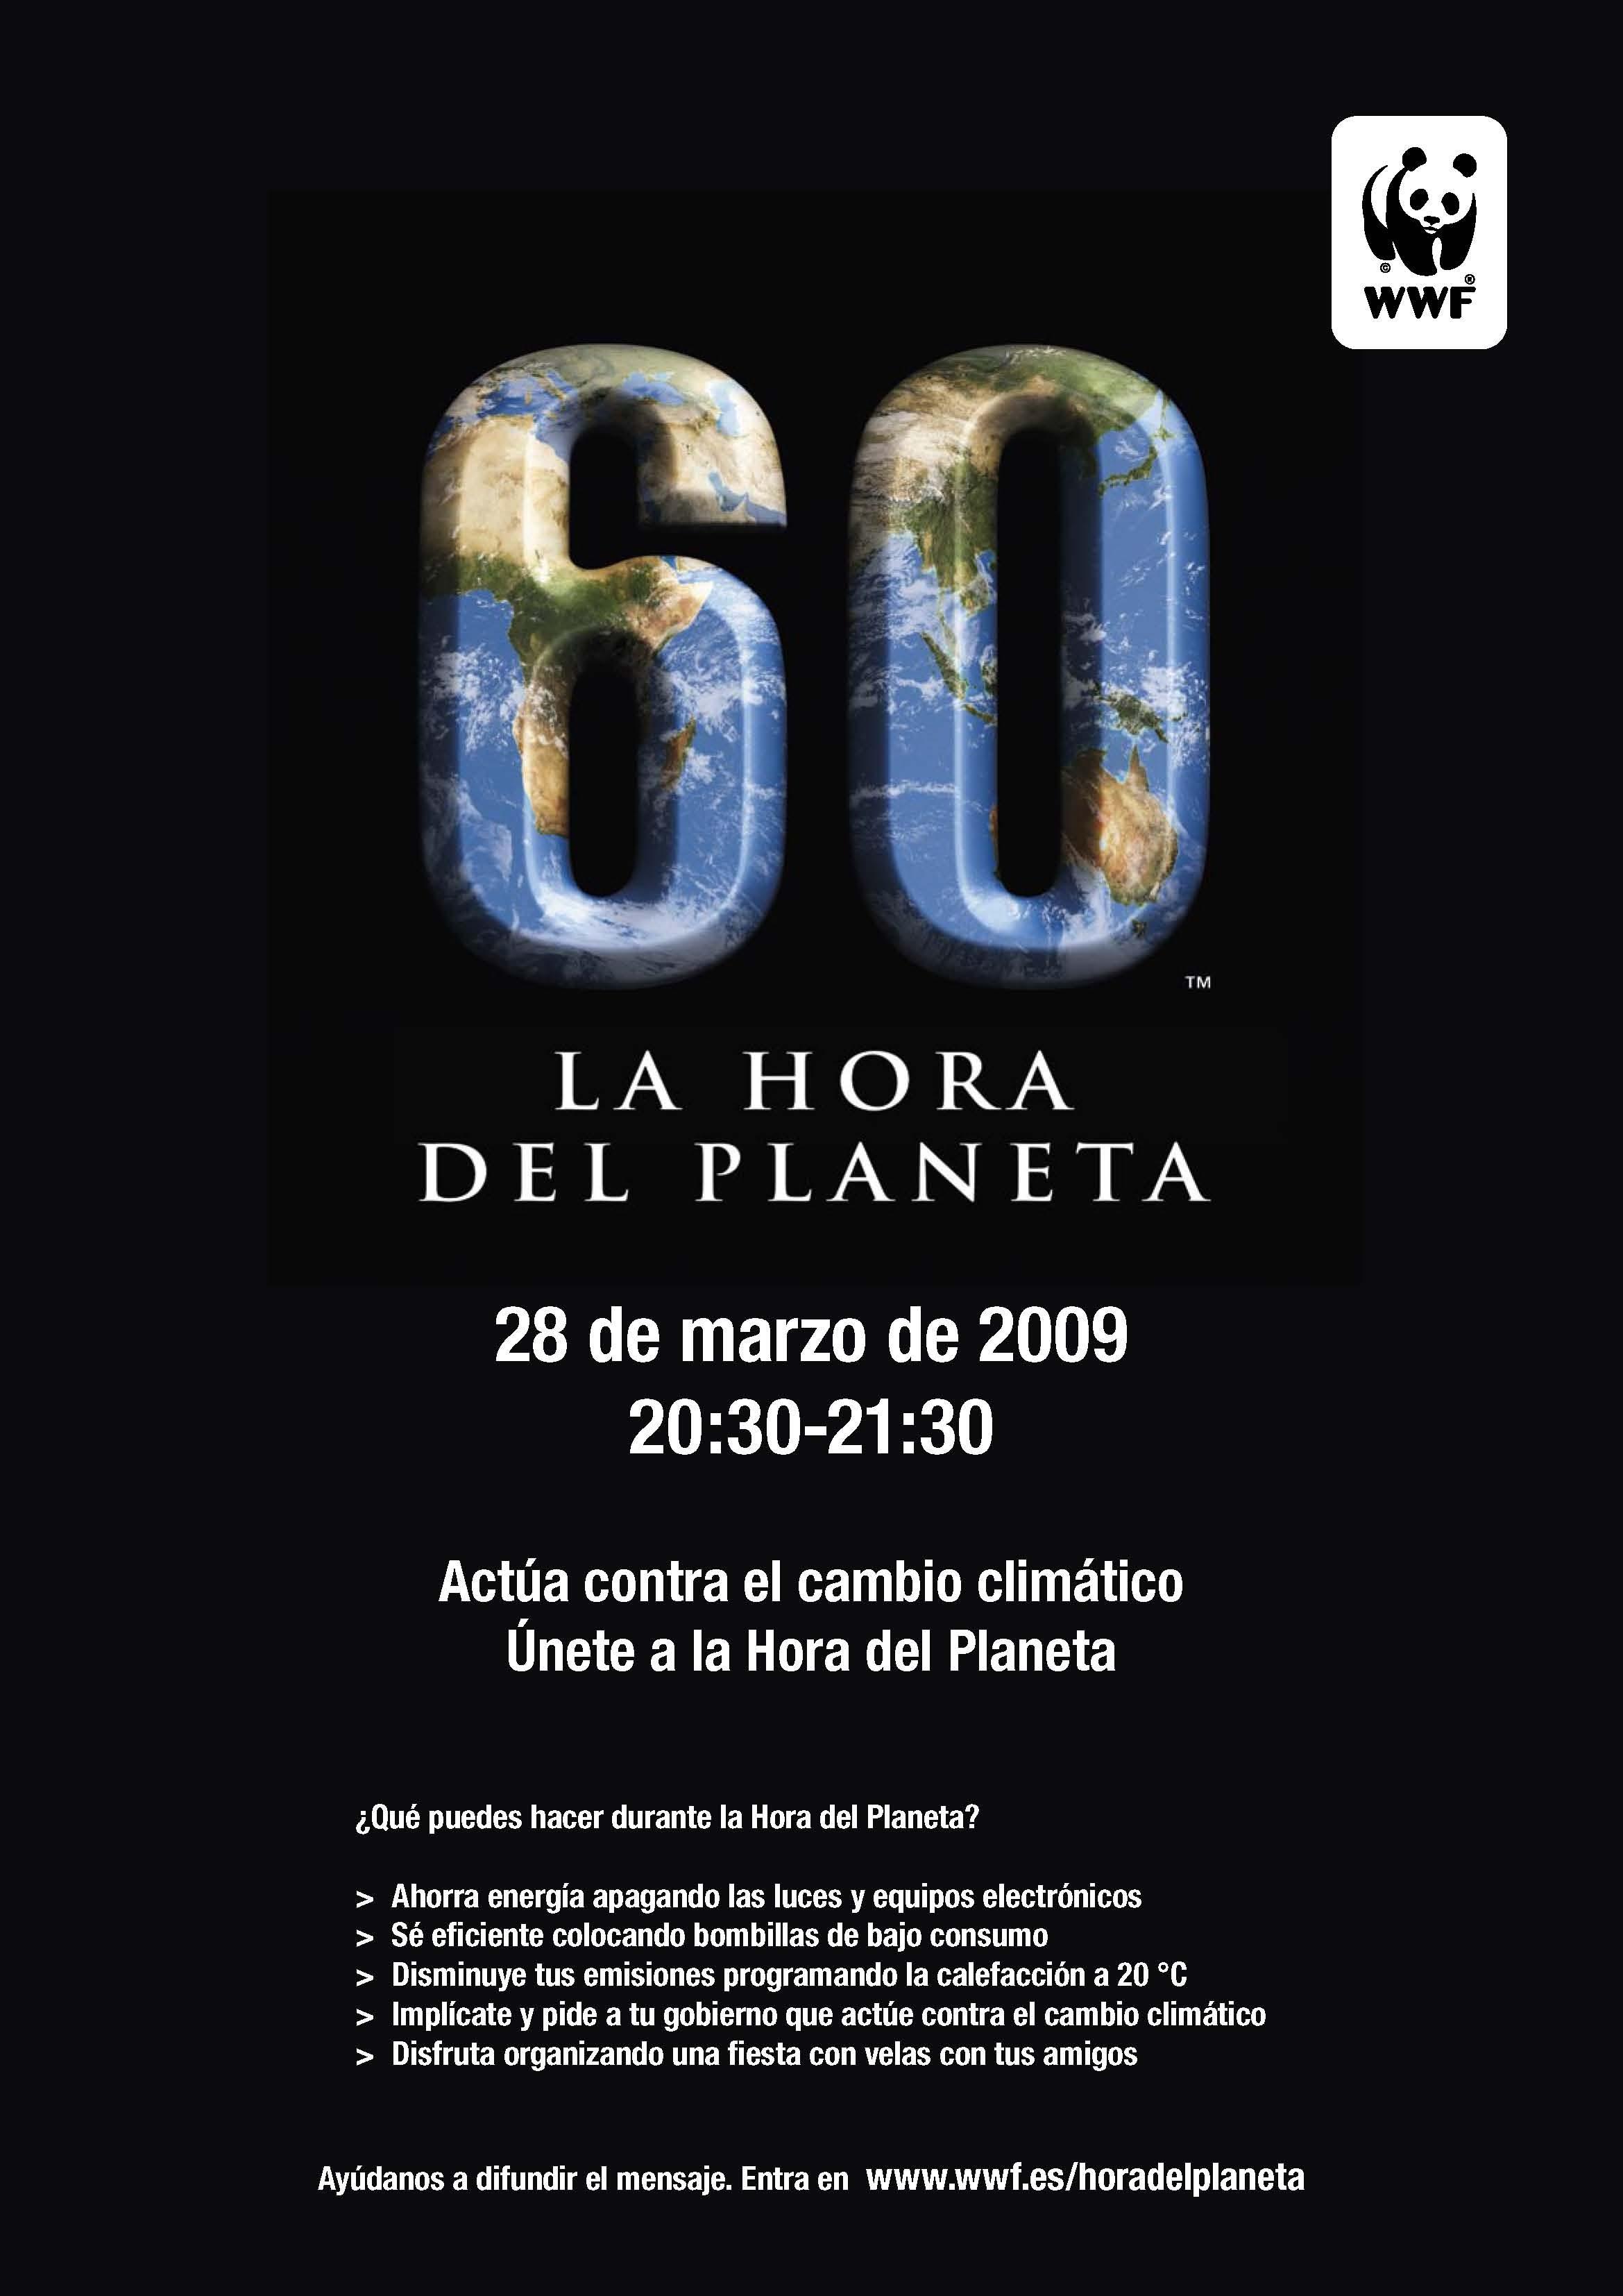 http://webjaen.files.wordpress.com/2009/03/la_hora_del_planeta_a3.jpg